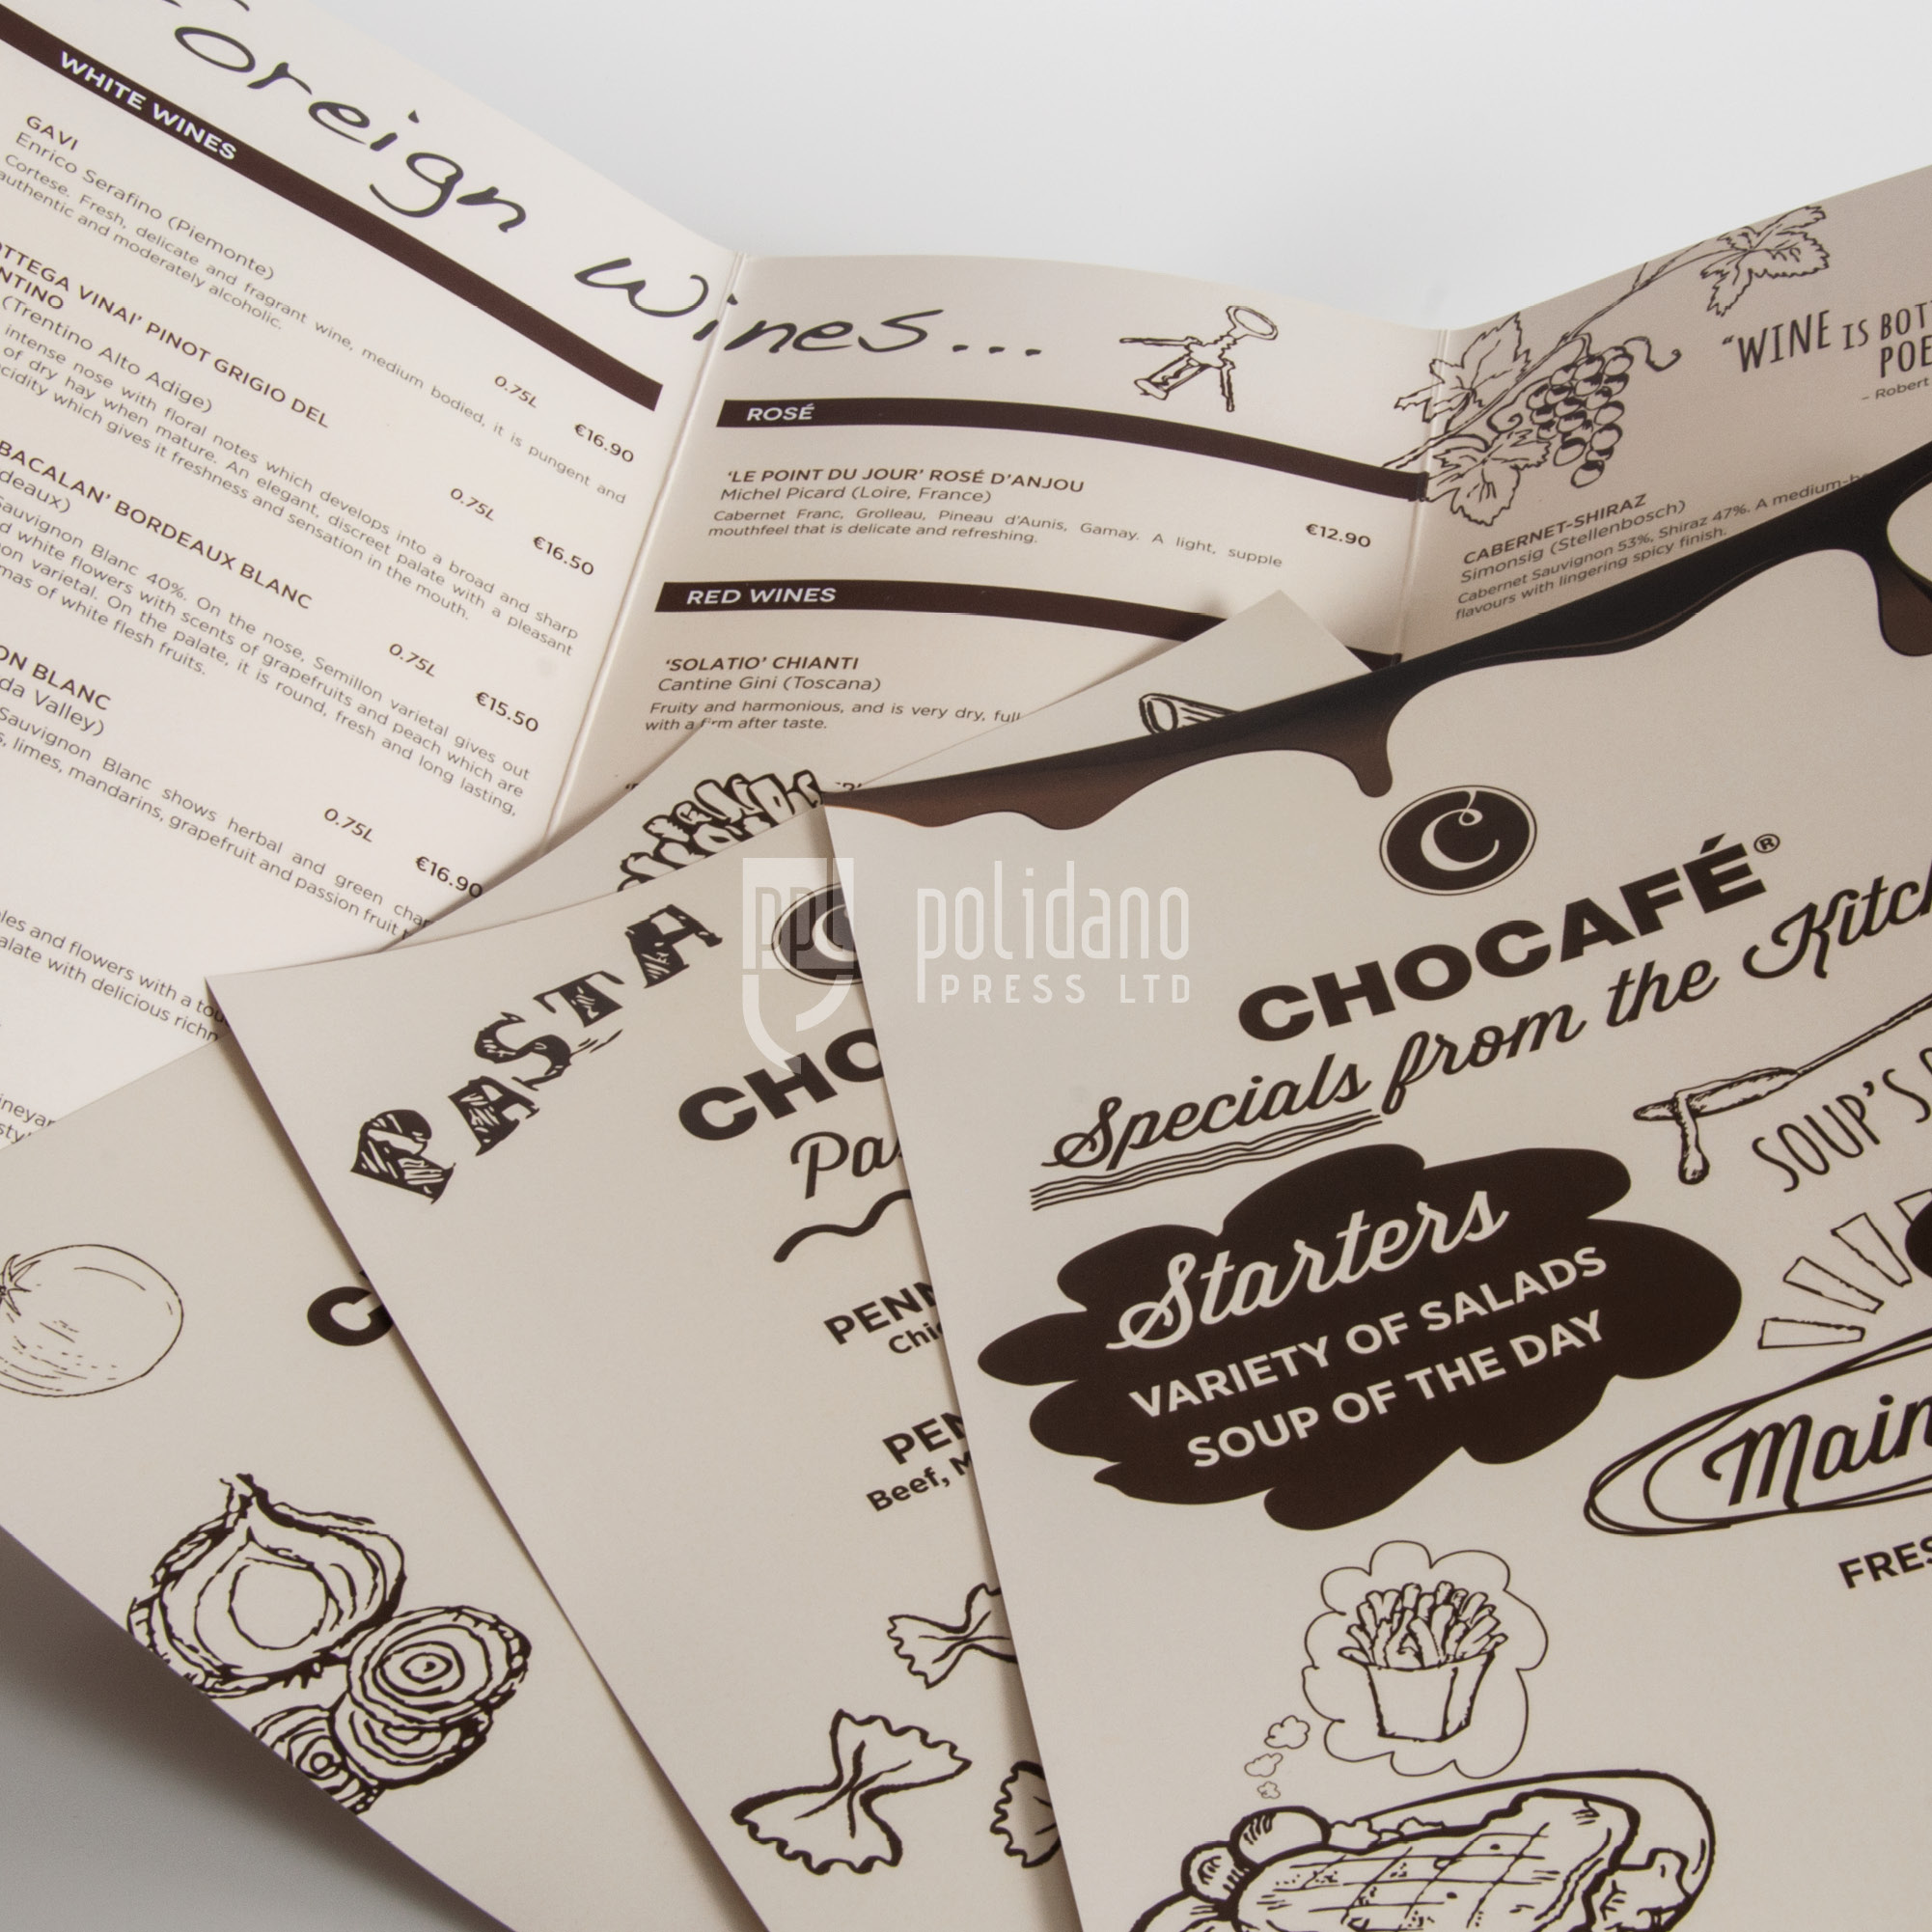 Chocafe menus